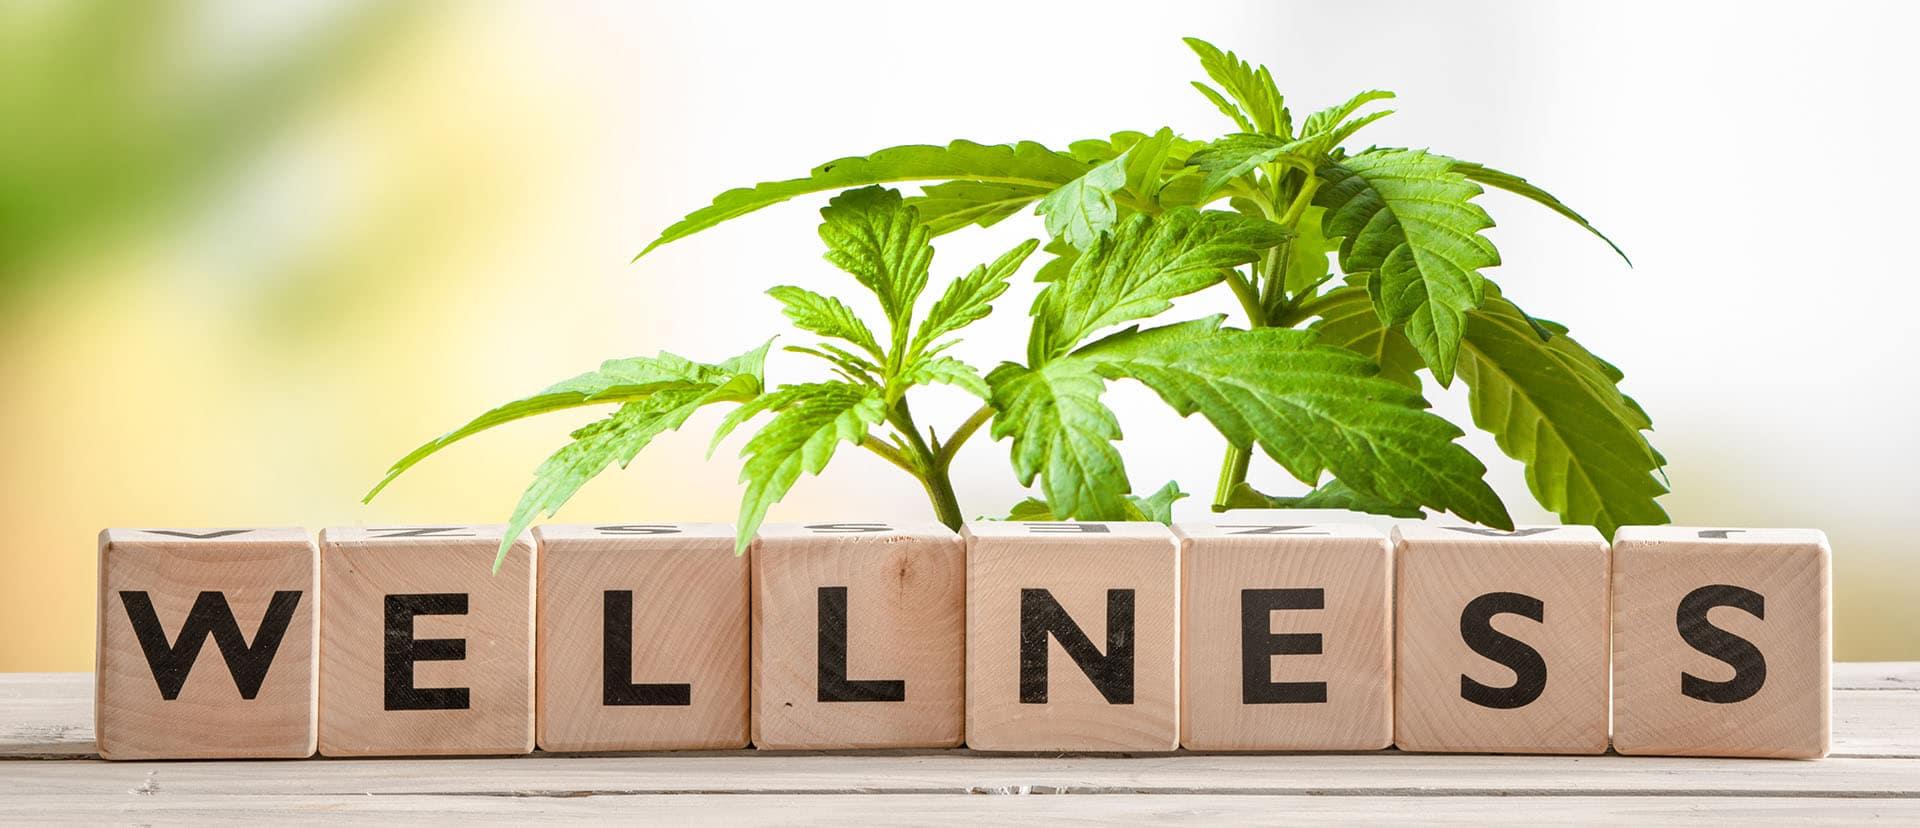 Cannabis and Wellness